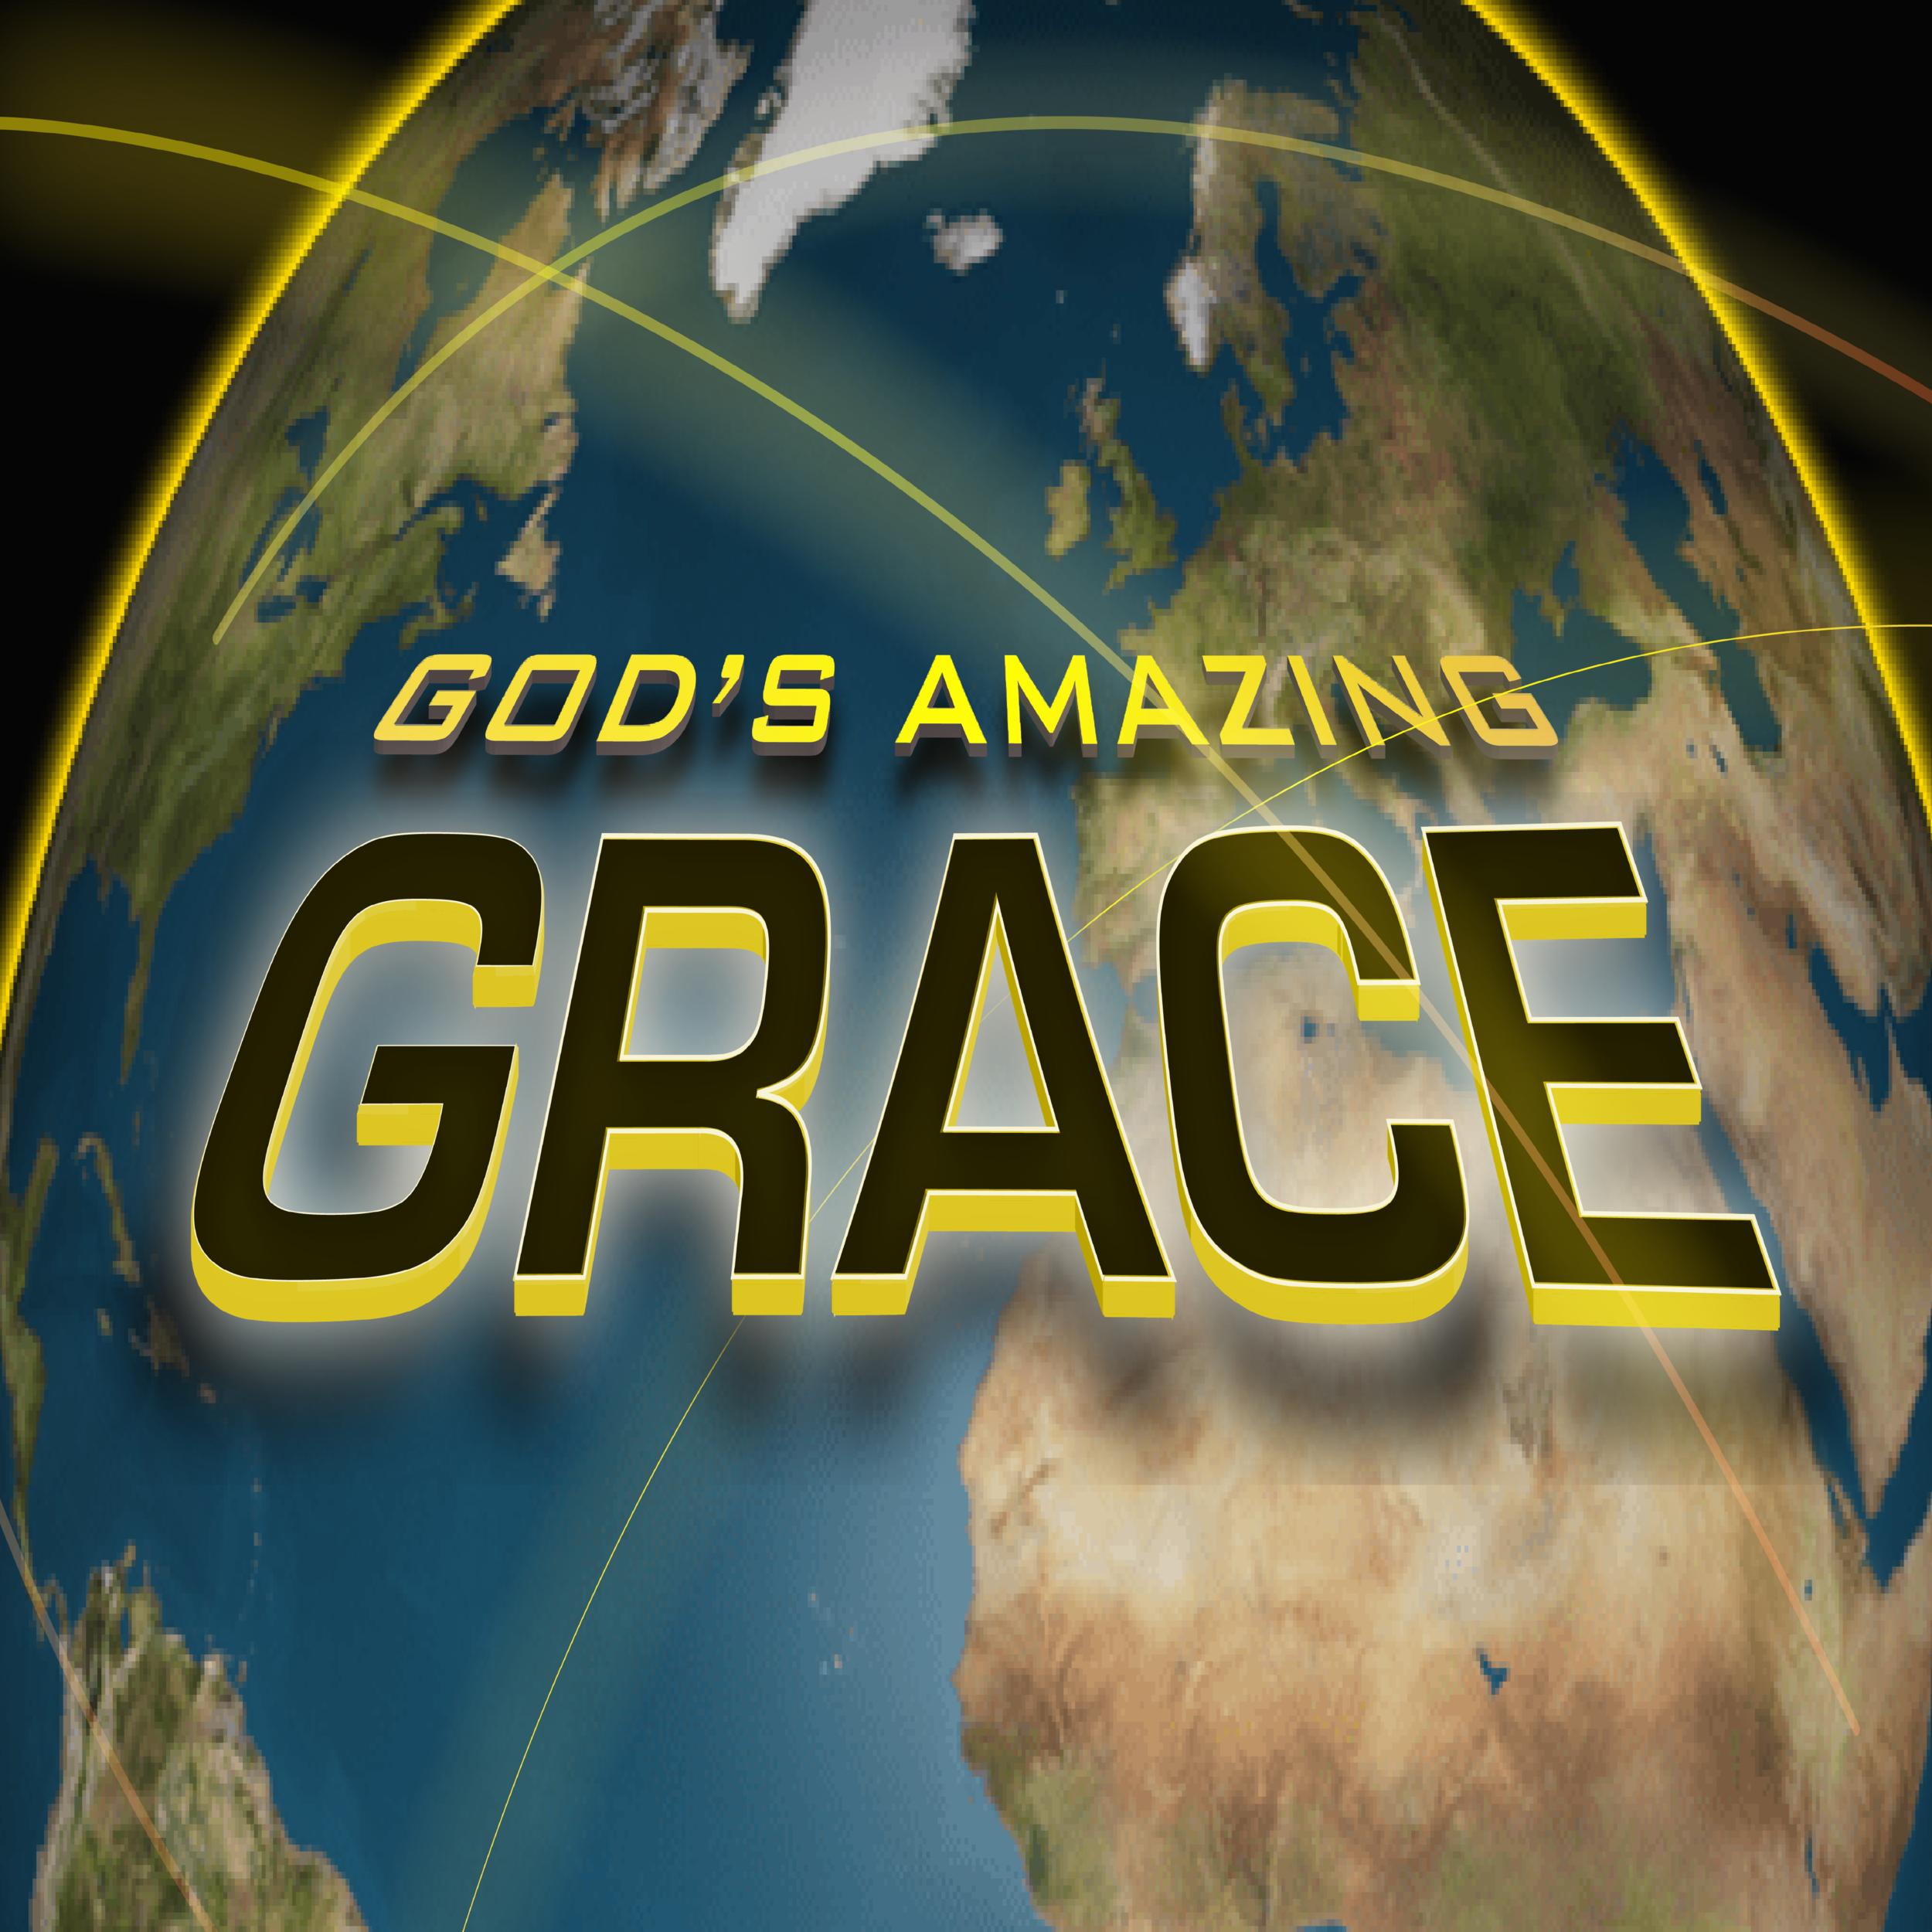 godsamazinggrace1024x1024-01.png